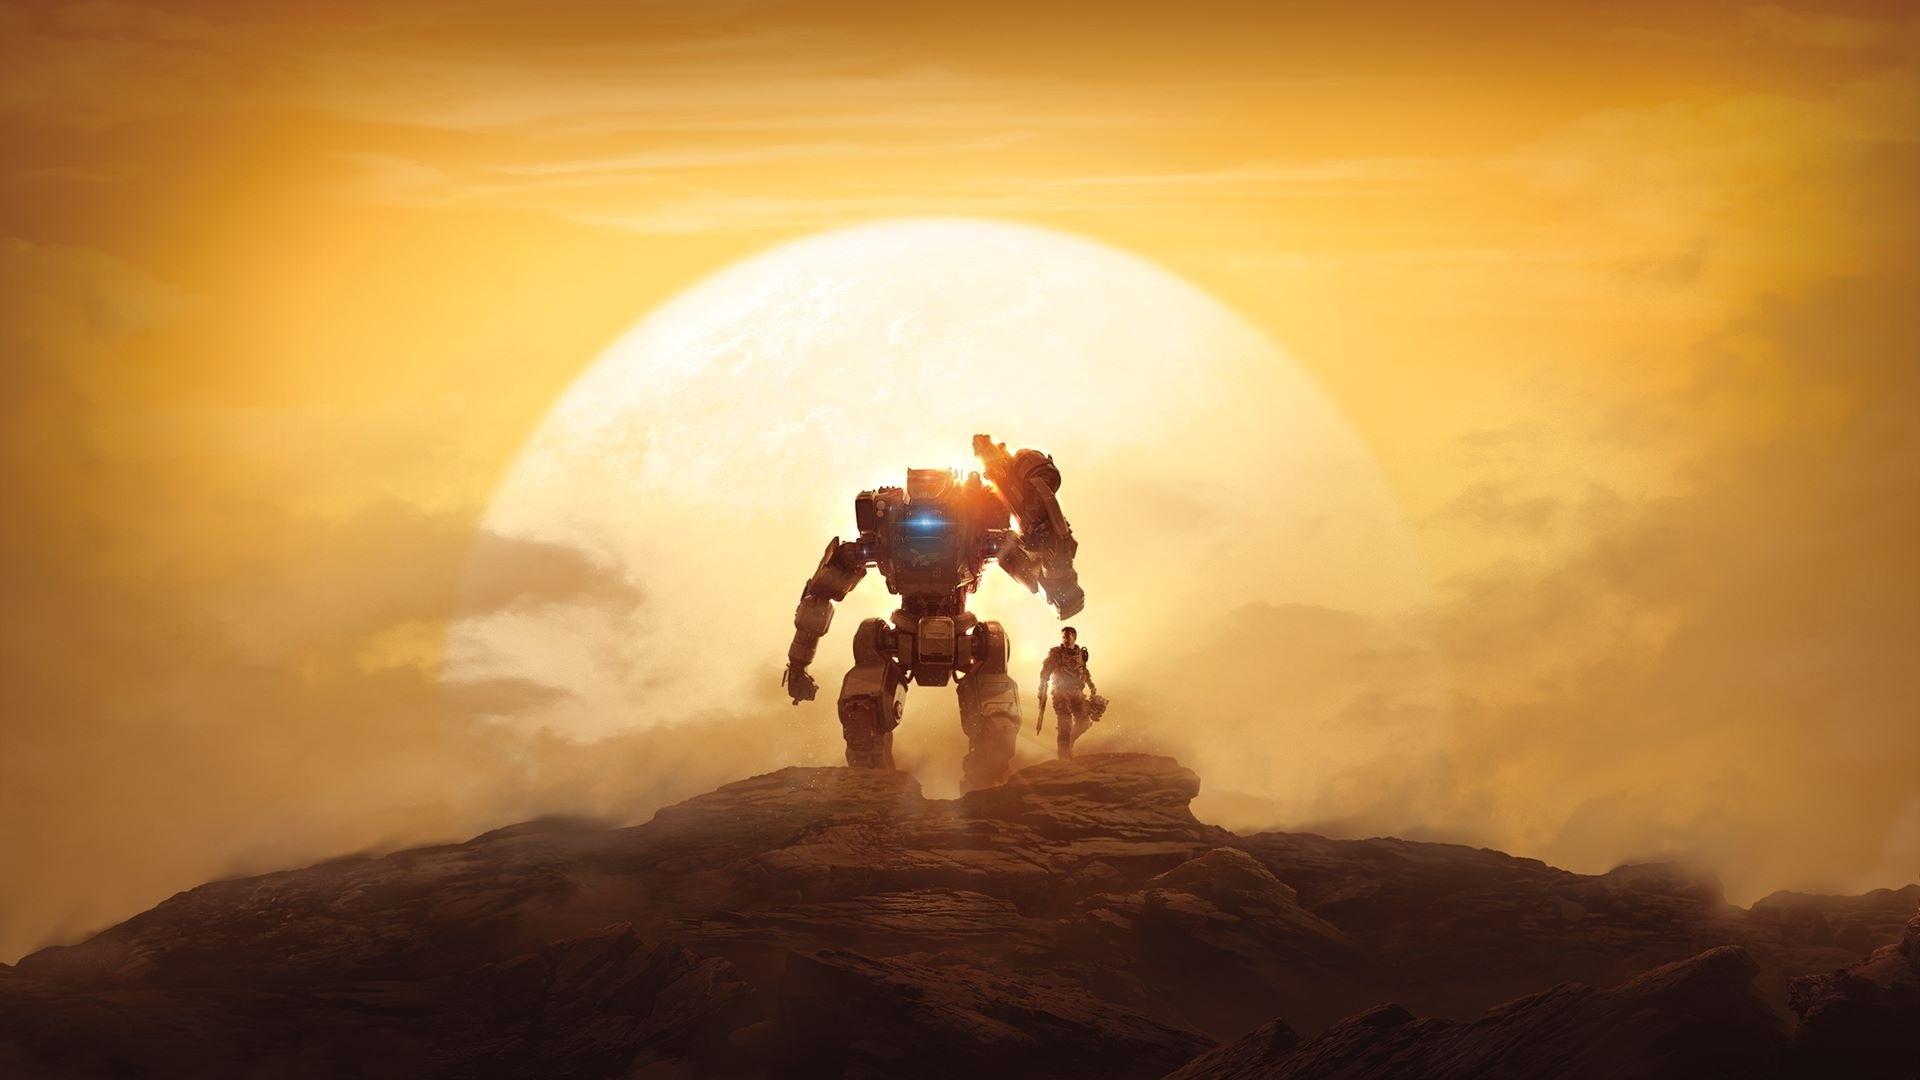 Titanfall 2 hd background